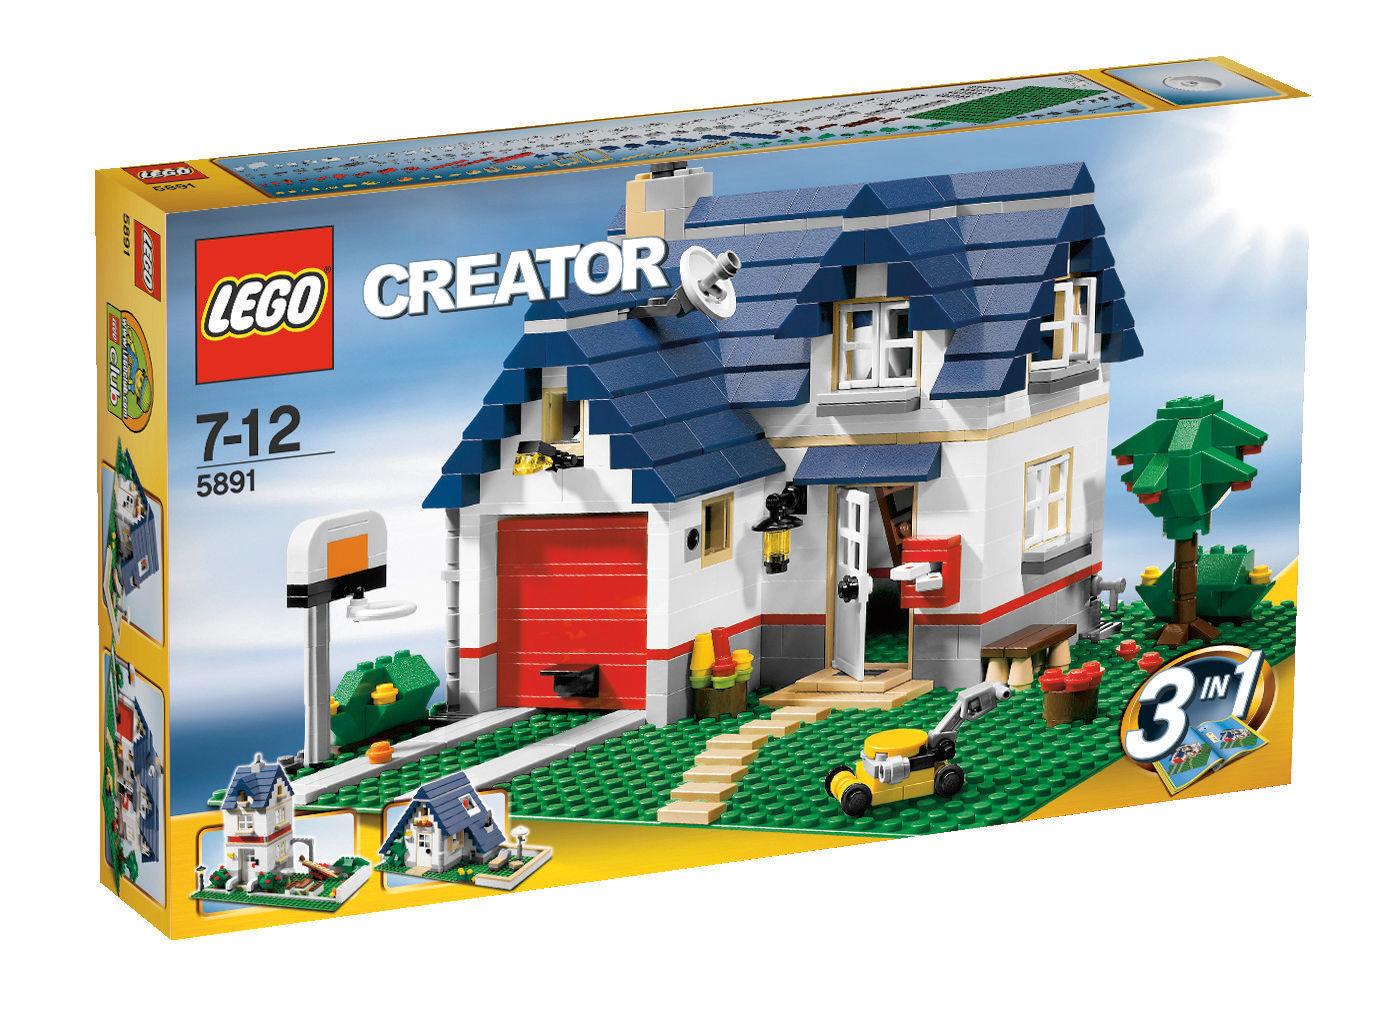 LEGO Creator Maison avec Garage (5891) NEUF & neuf dans sa boîte